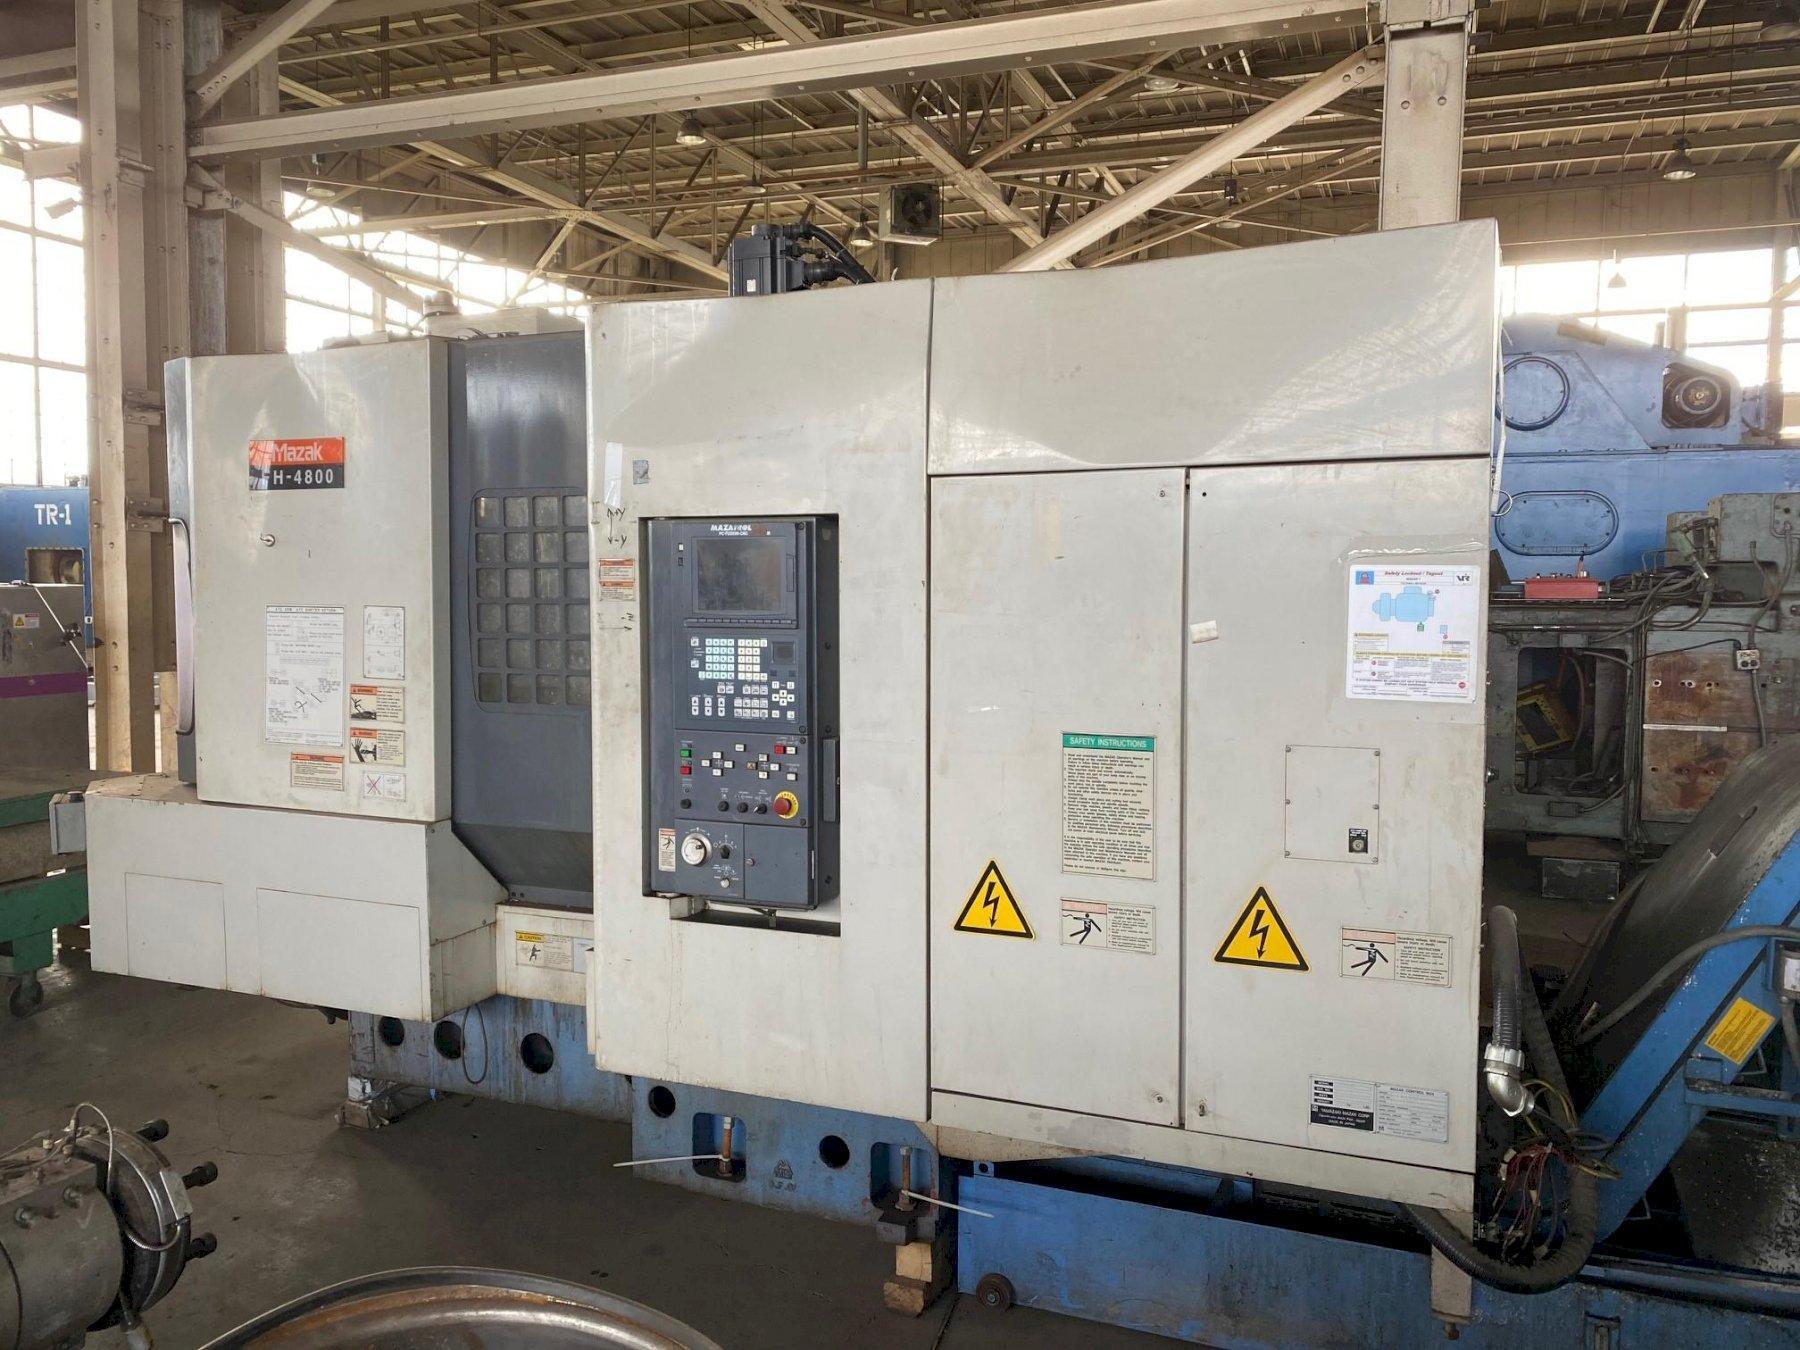 Mazak FH-4800 CNC Horizontal Machining Center